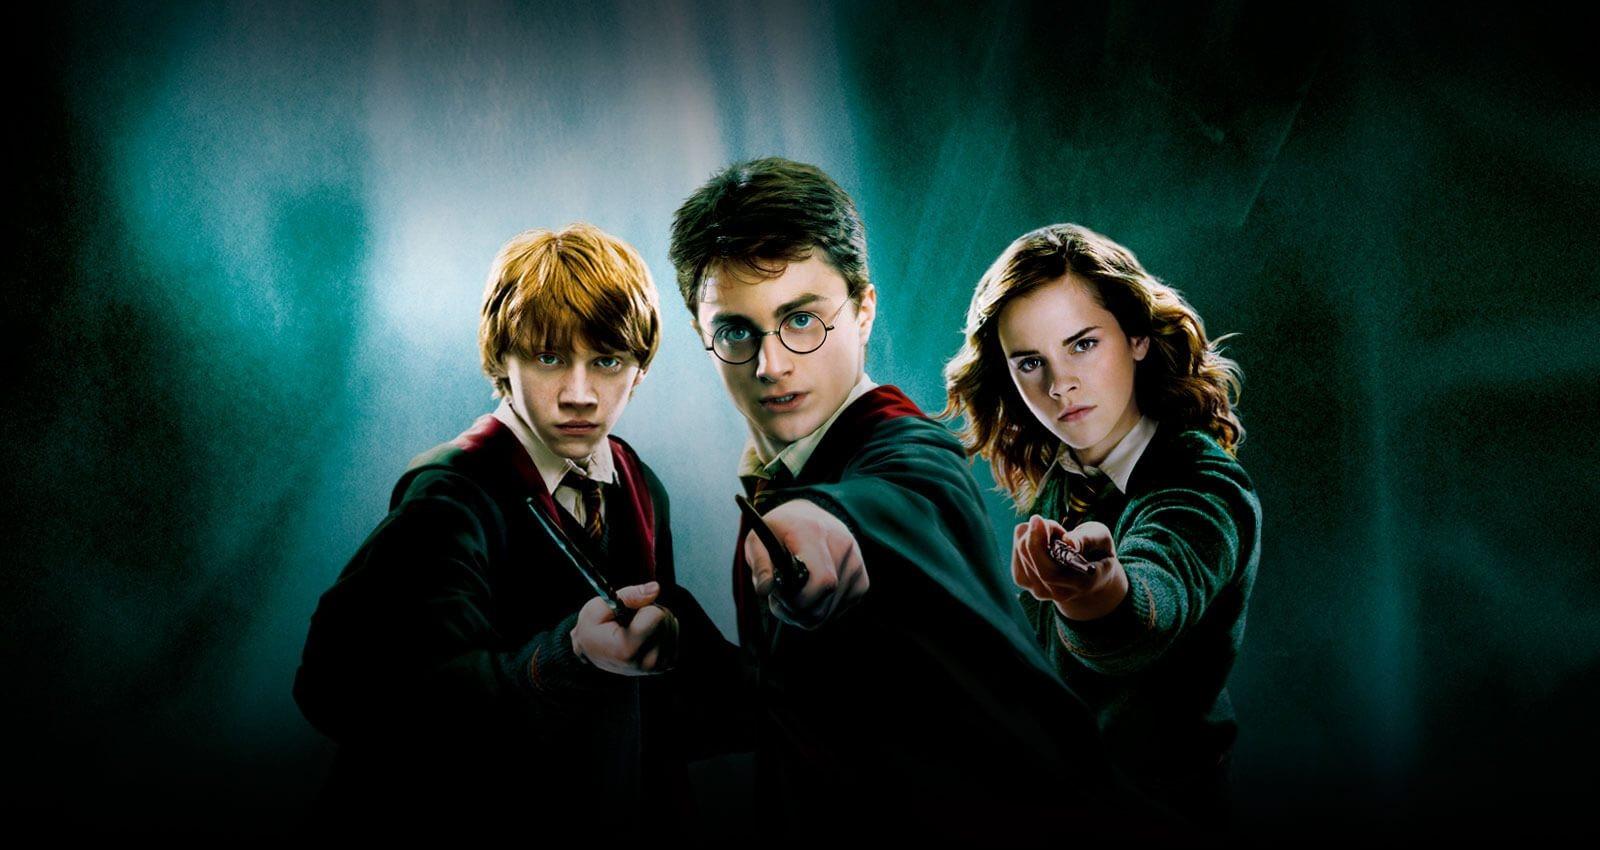 Harry Potter : 2 indices, un personnage